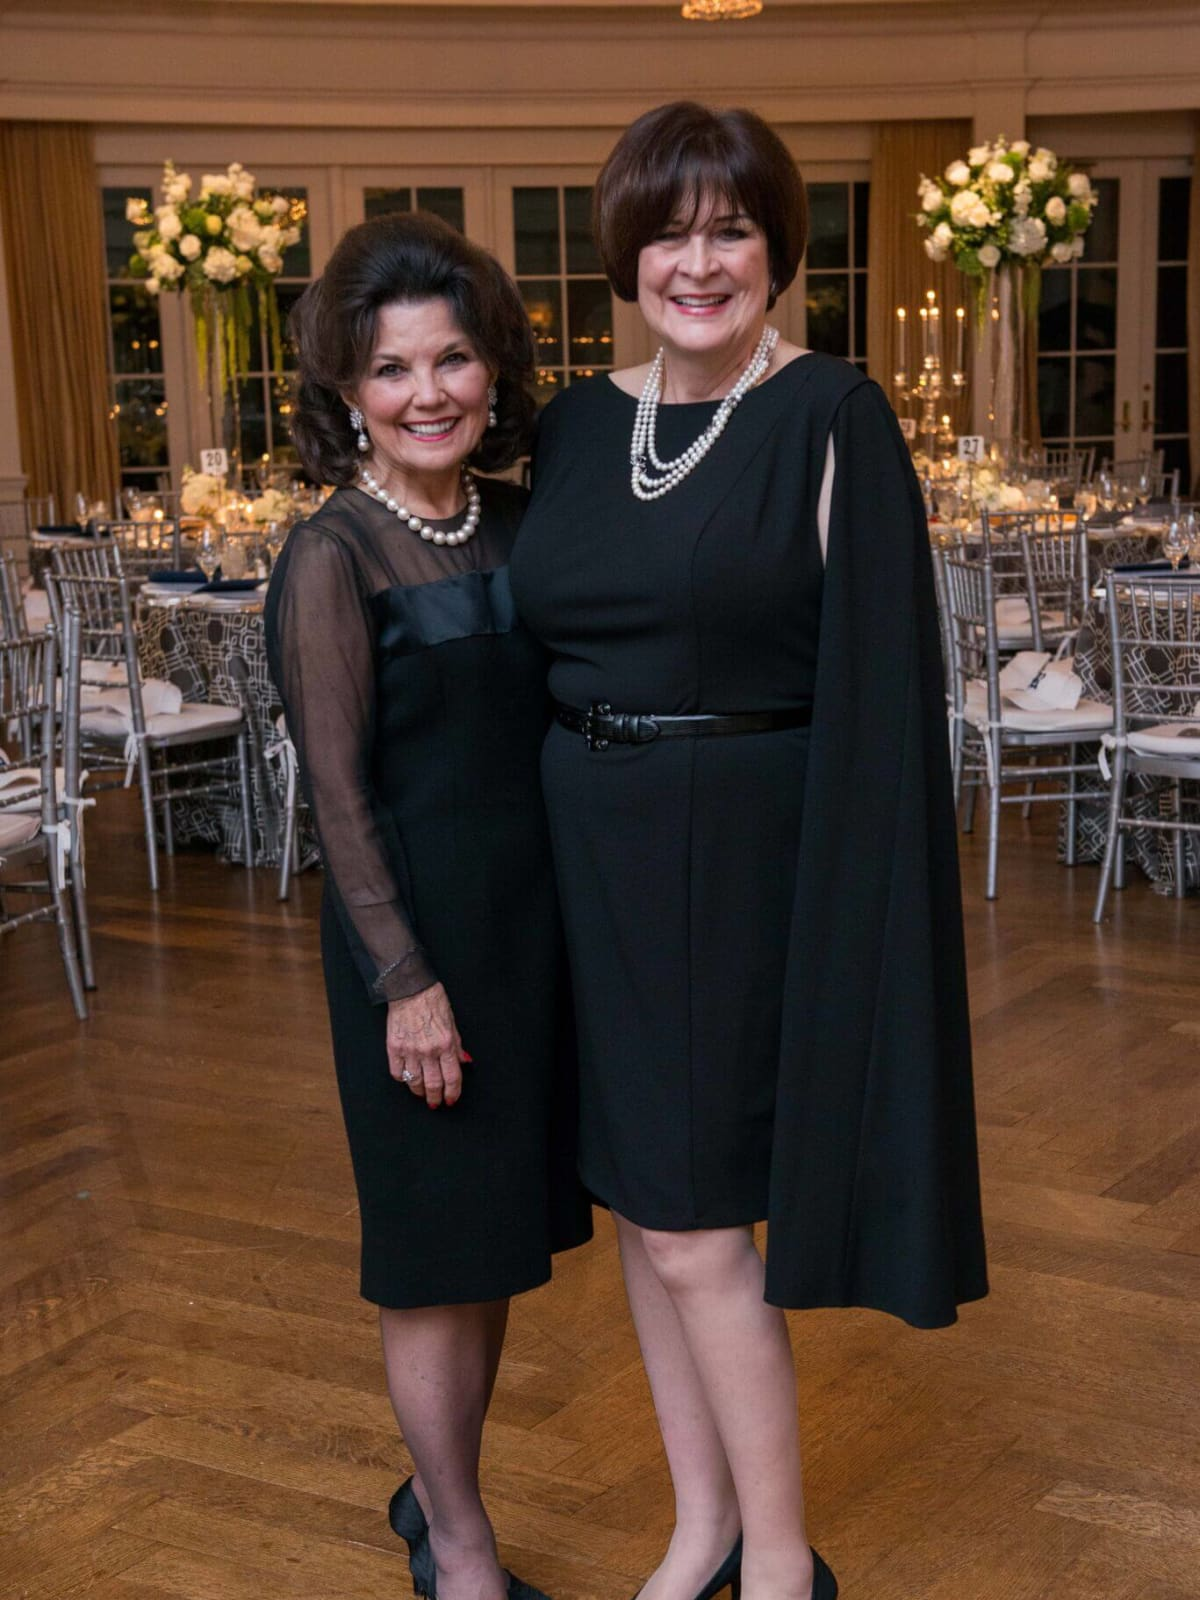 Linda McReynolds, Cynthia Allshouse at Rice Honors Gala